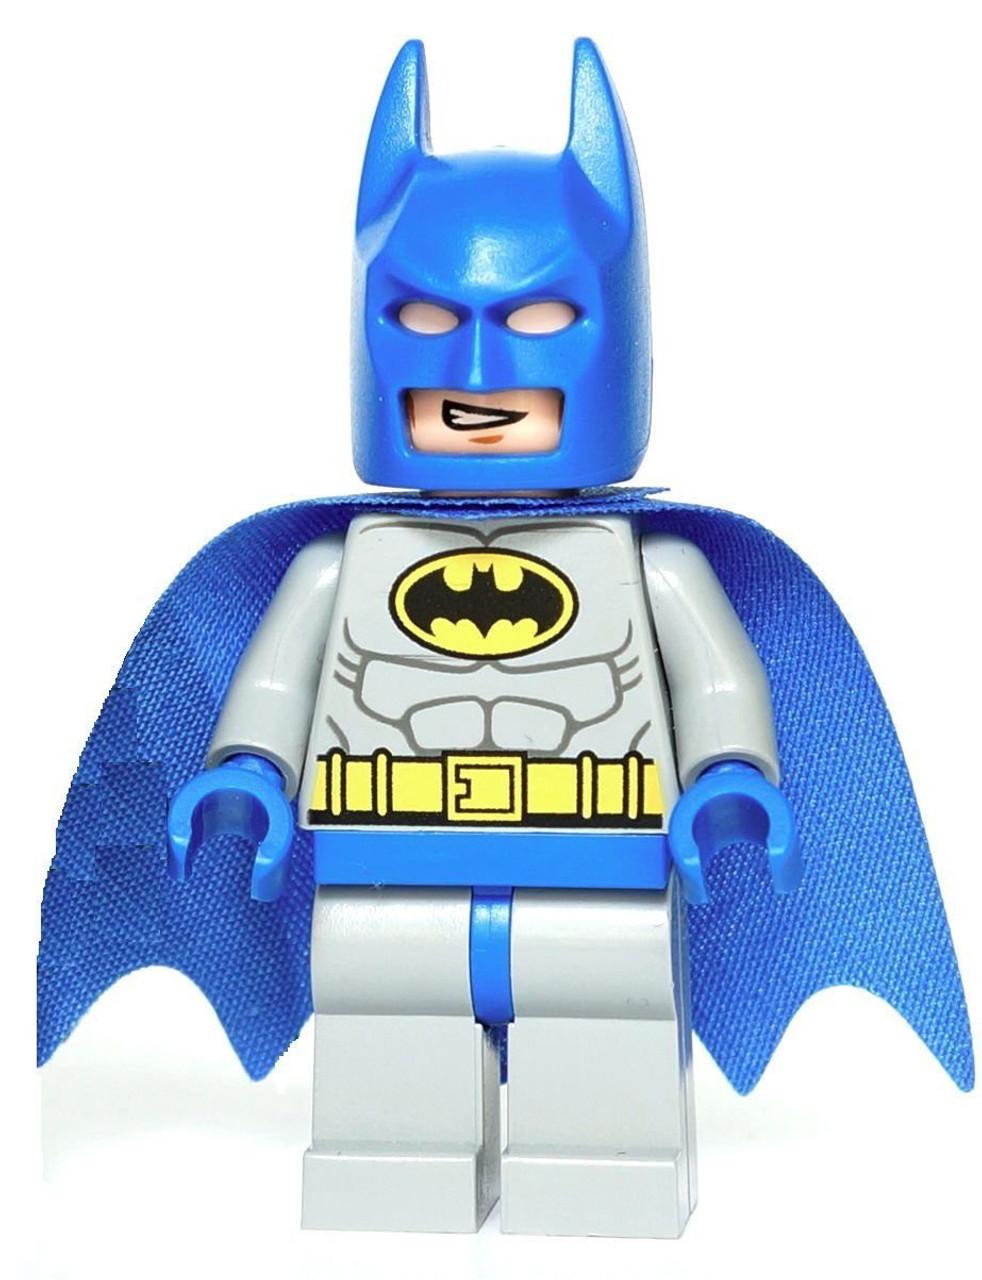 LEGO DC Batman Minifigure Classic Blue Gray Loose - ToyWiz